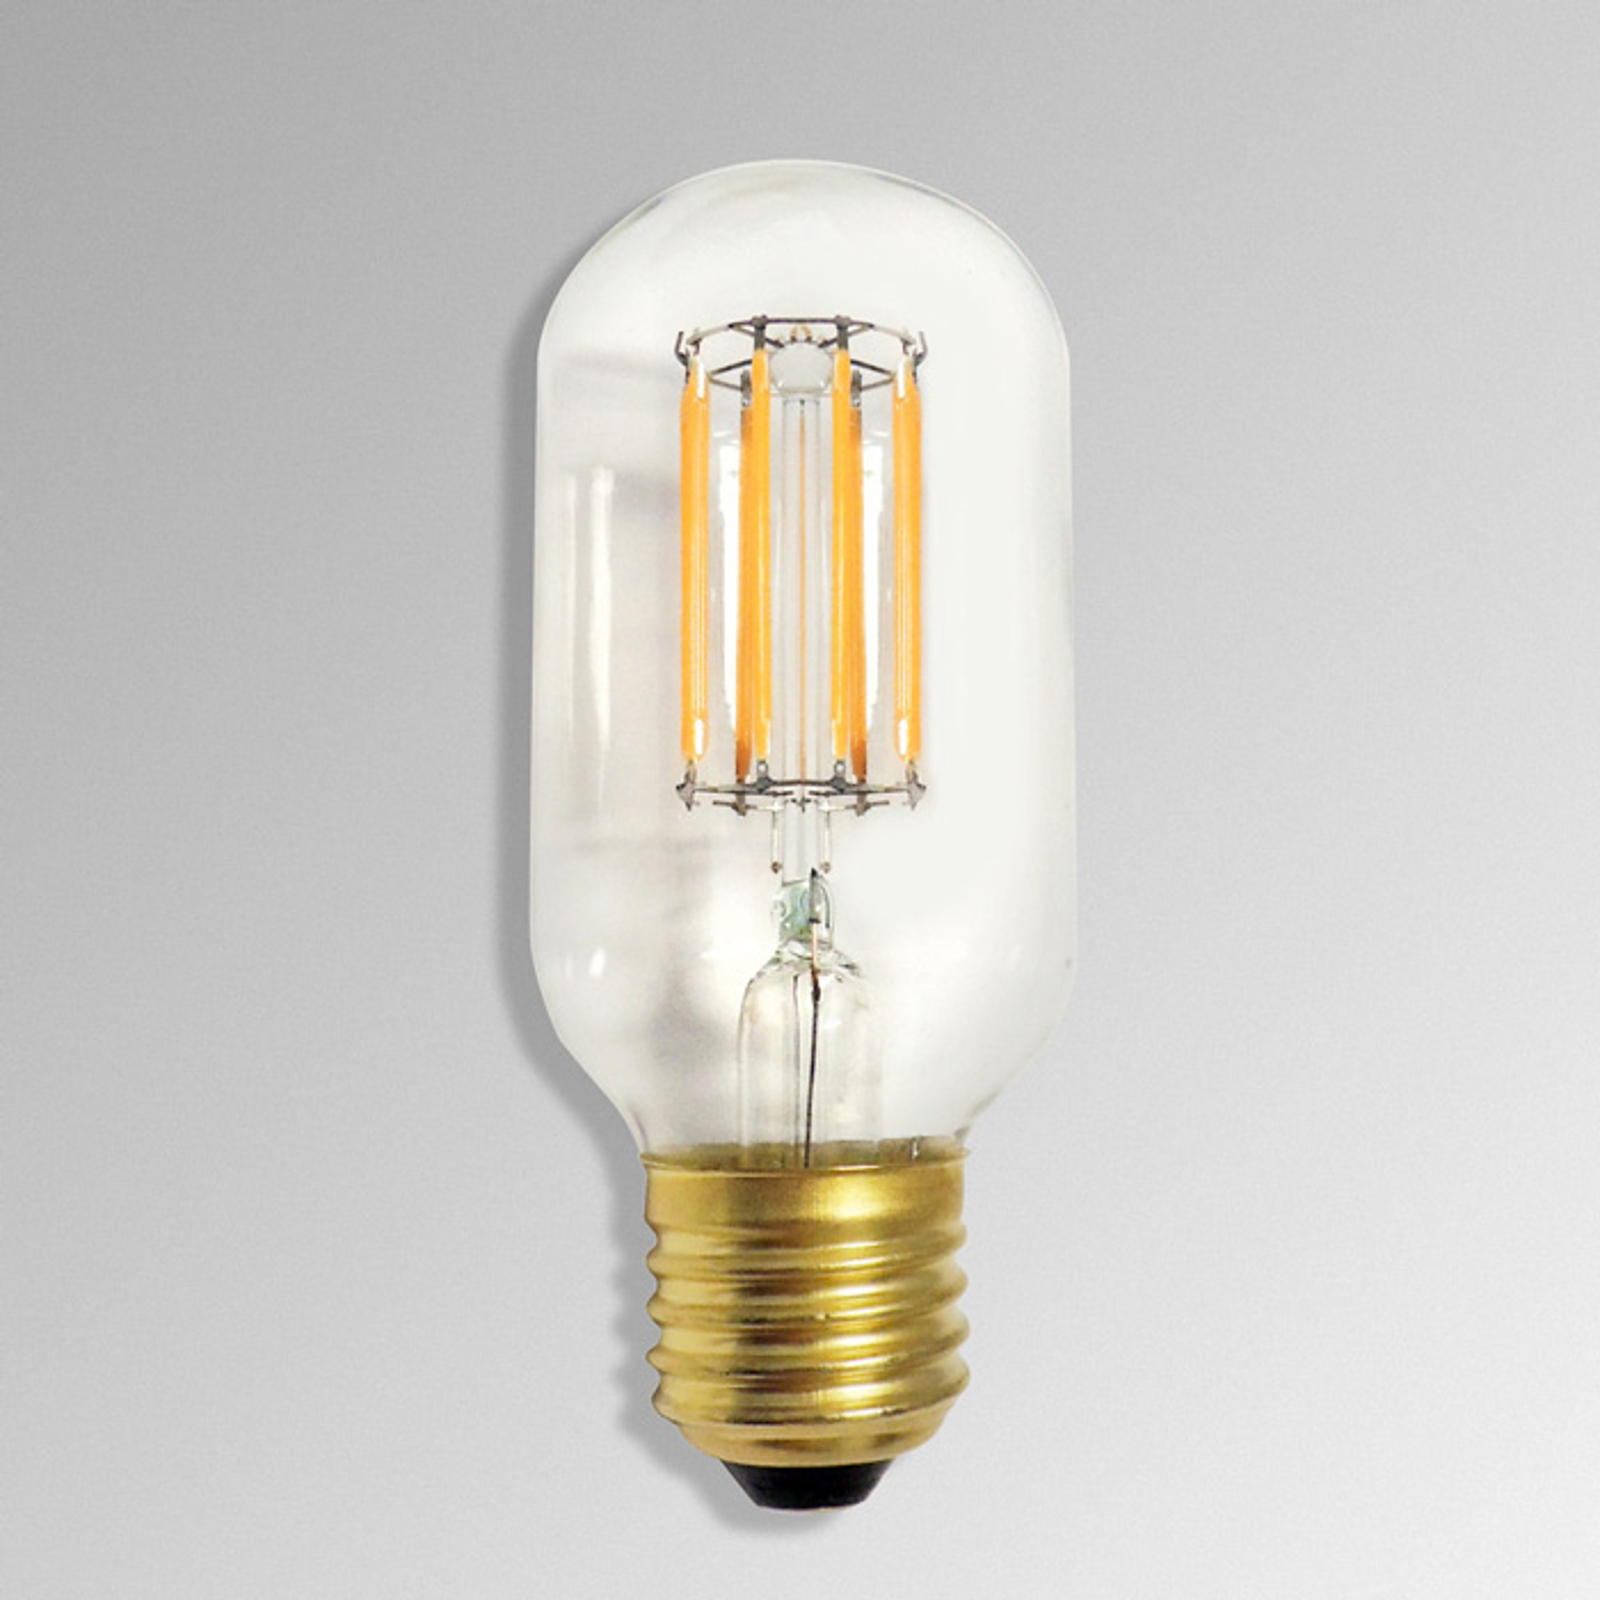 E27 4,7W 922 LED-rørpære i kultrådslook